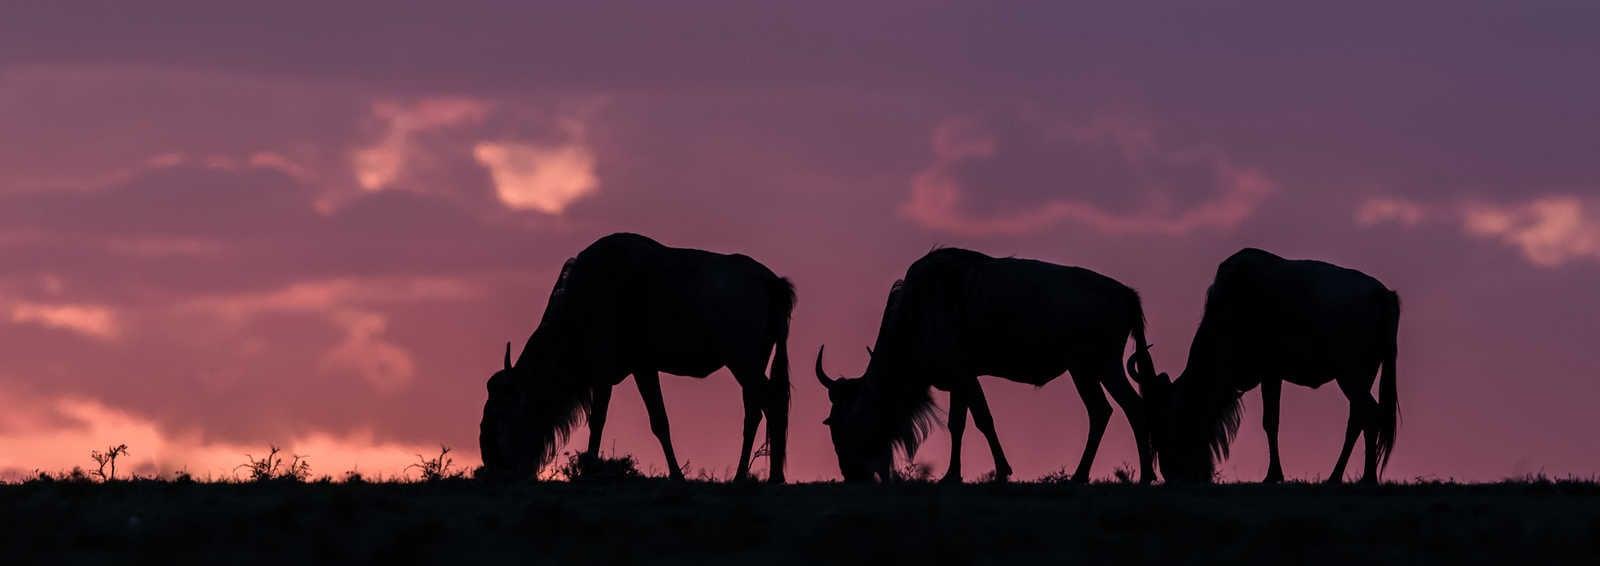 Tanzania wildebeest - Wildlife Exposed with Paul Goldstein